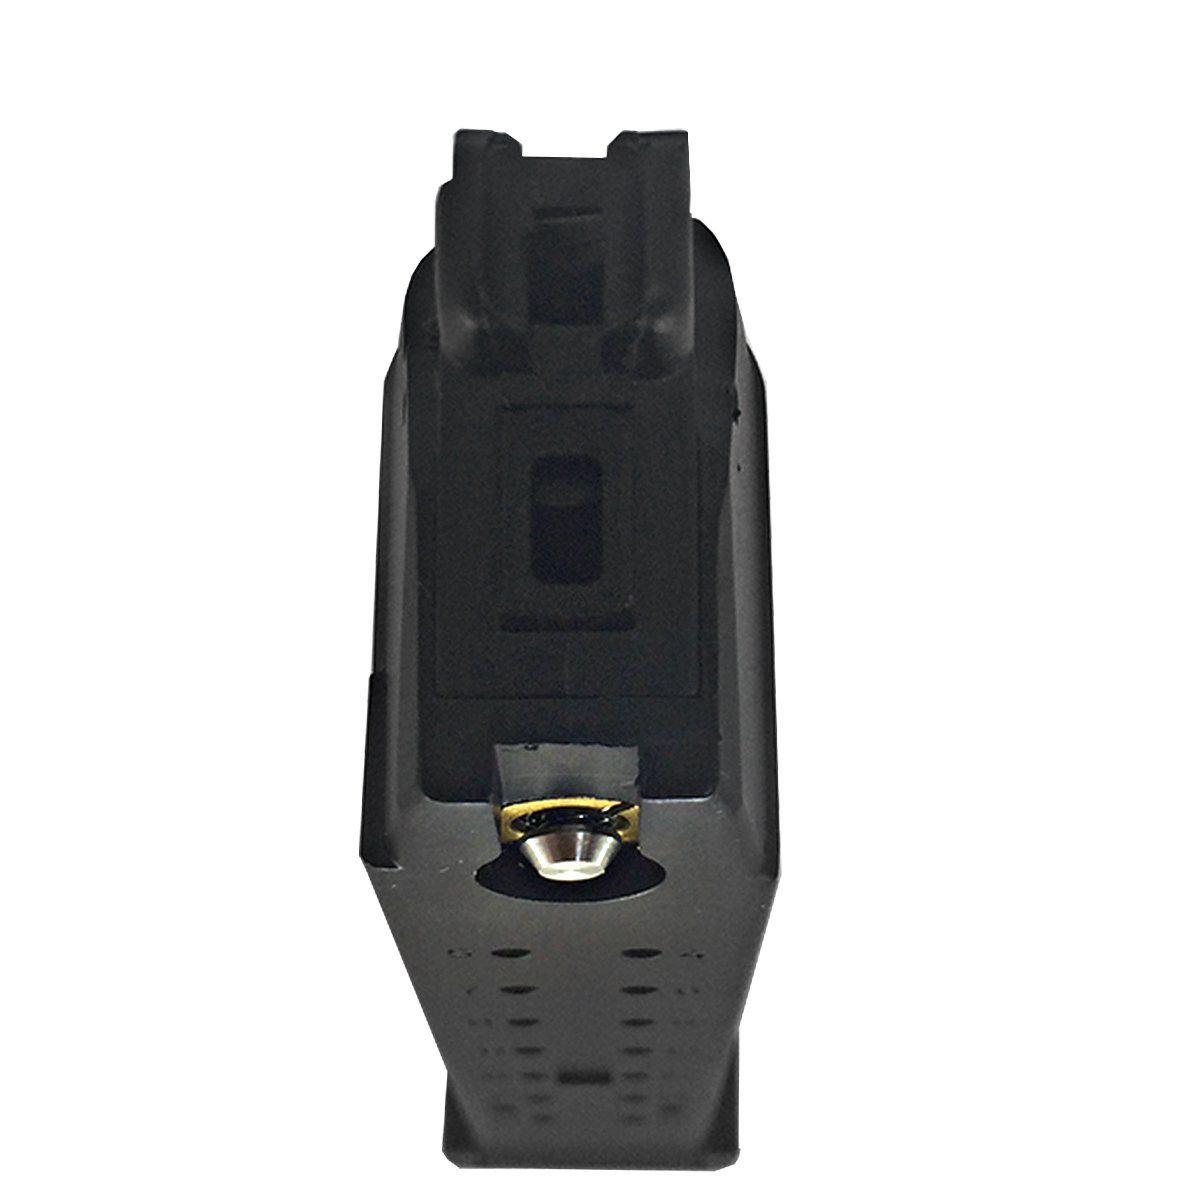 Magazine Para Pistola Army Armament Glock G17 22BBs Preto